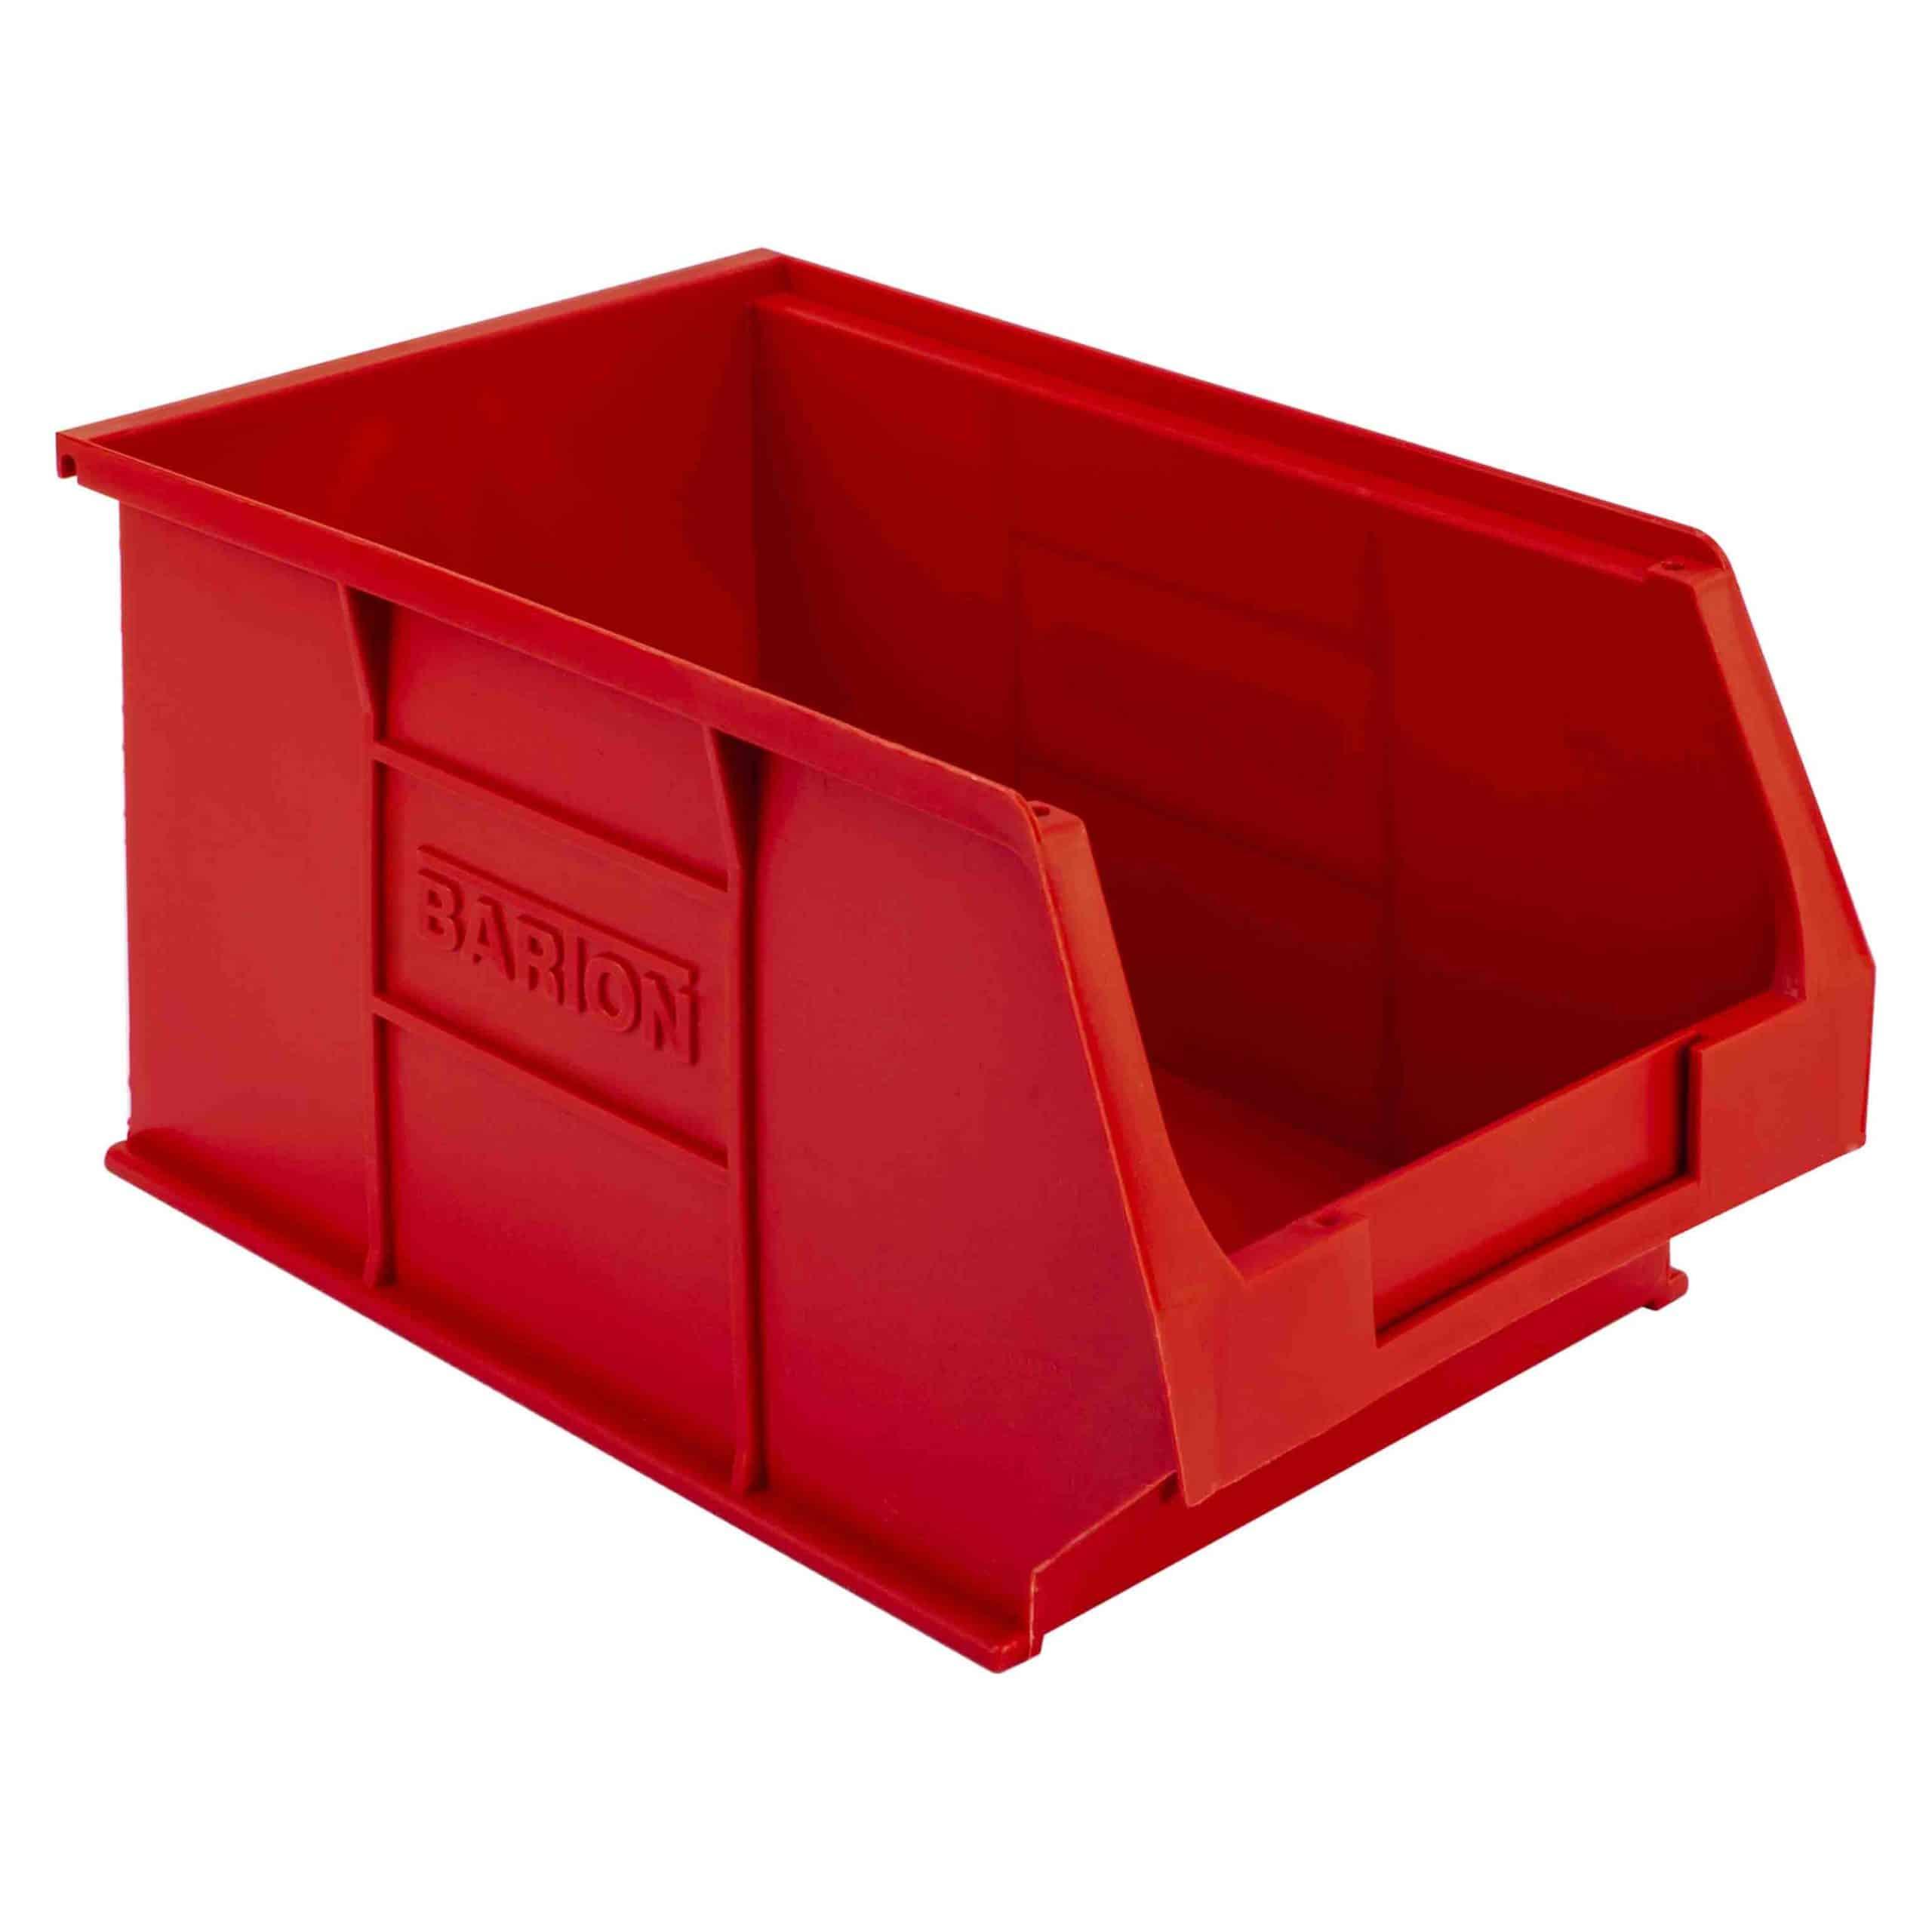 Barton TC3 Storage Containers